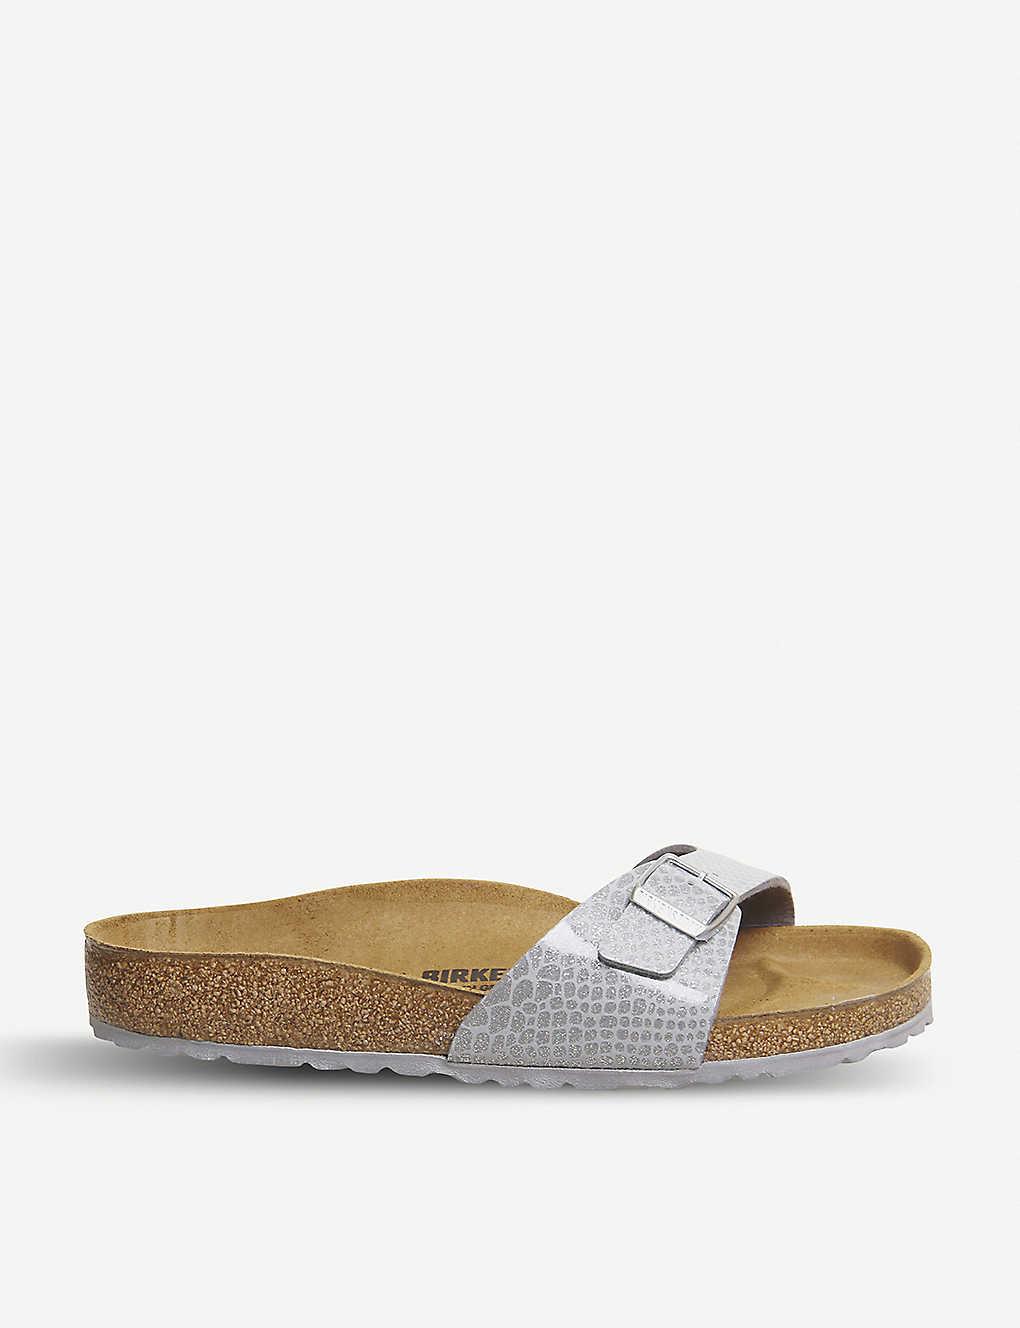 74735655f6825 BIRKENSTOCK - Madrid 1 metallic-leather sandals